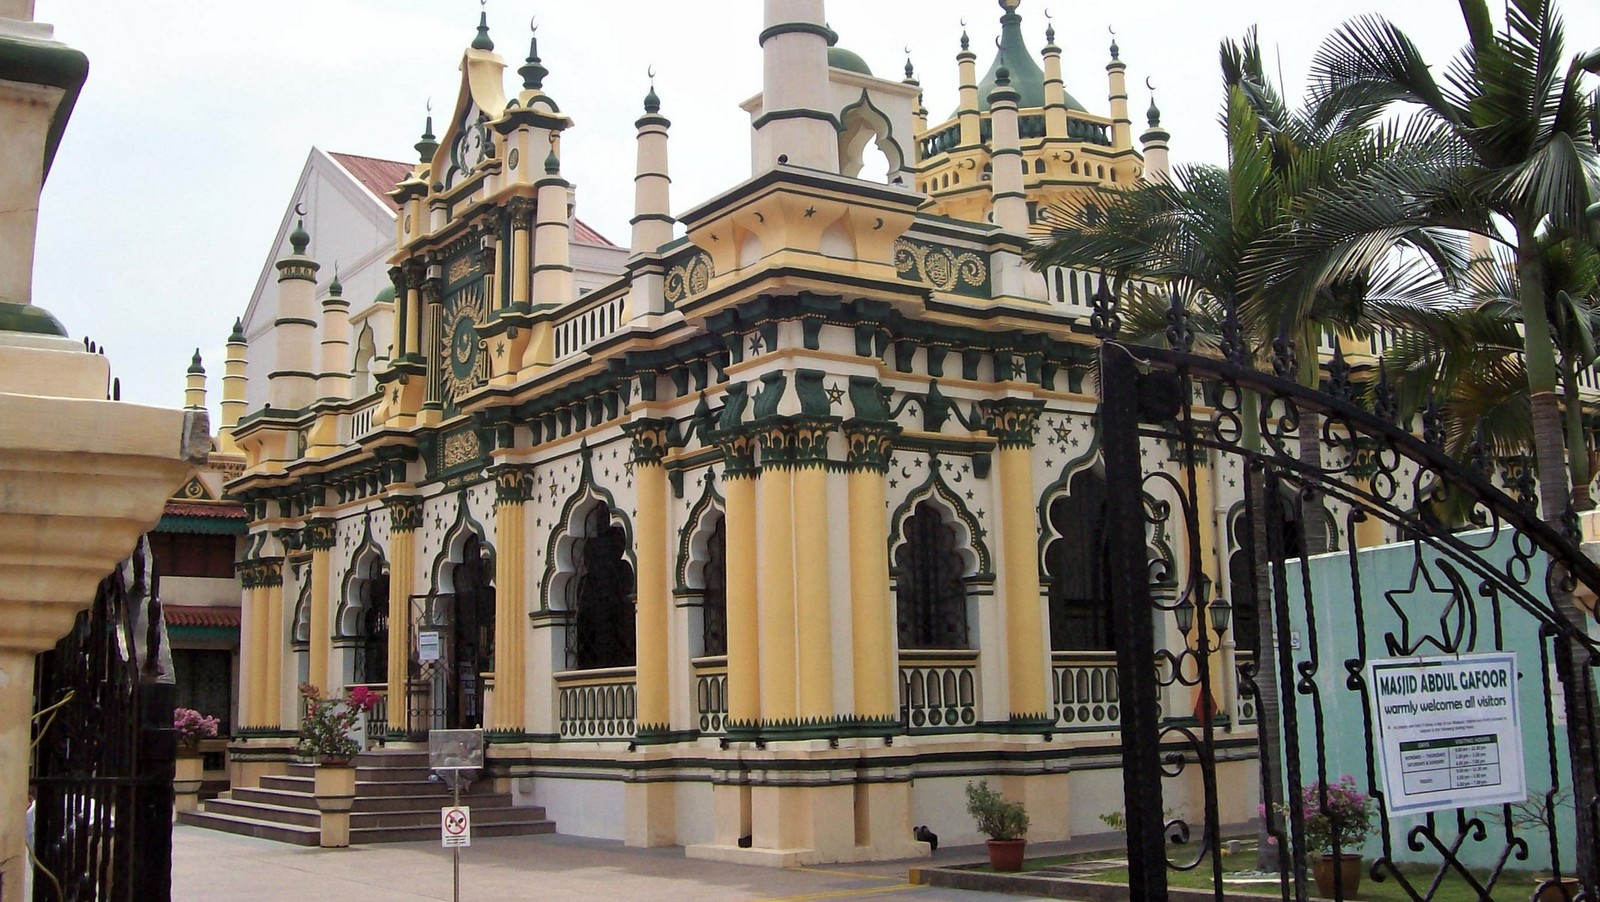 Abdul Gaffour Moschee Singapur